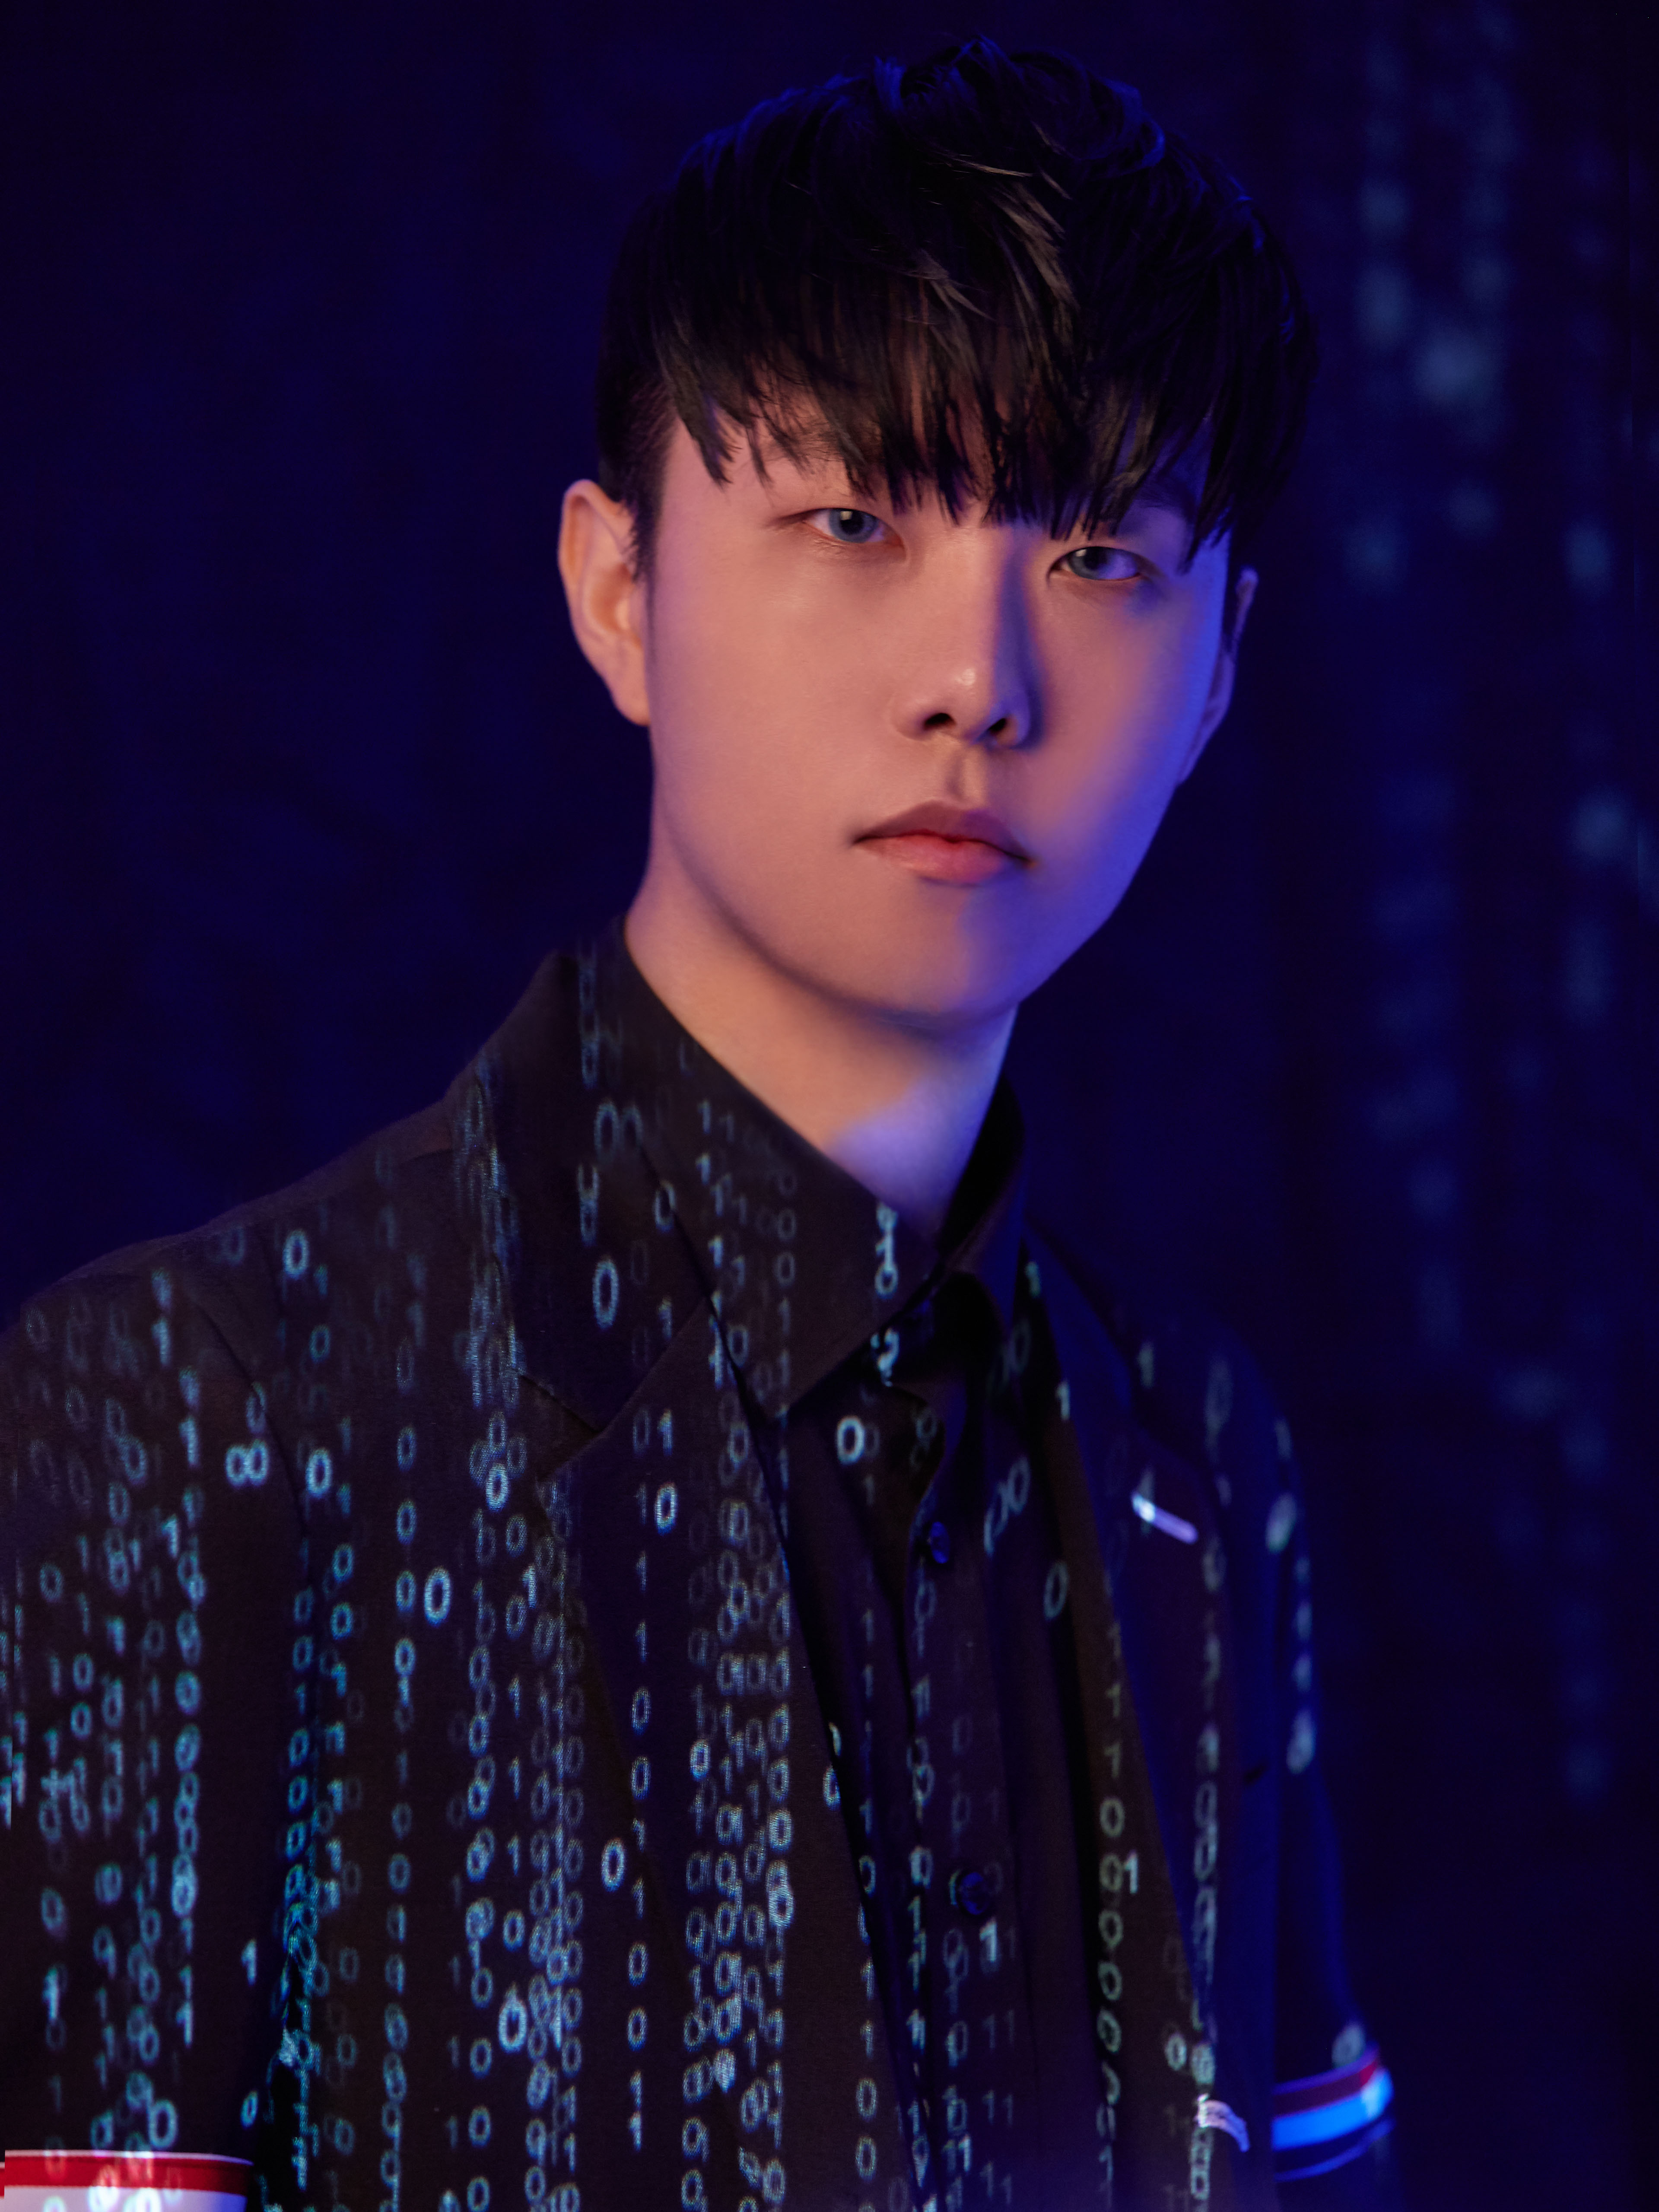 DJ兼制作人IMLAY今天下午5点公开新歌《Without U》音源和MV!